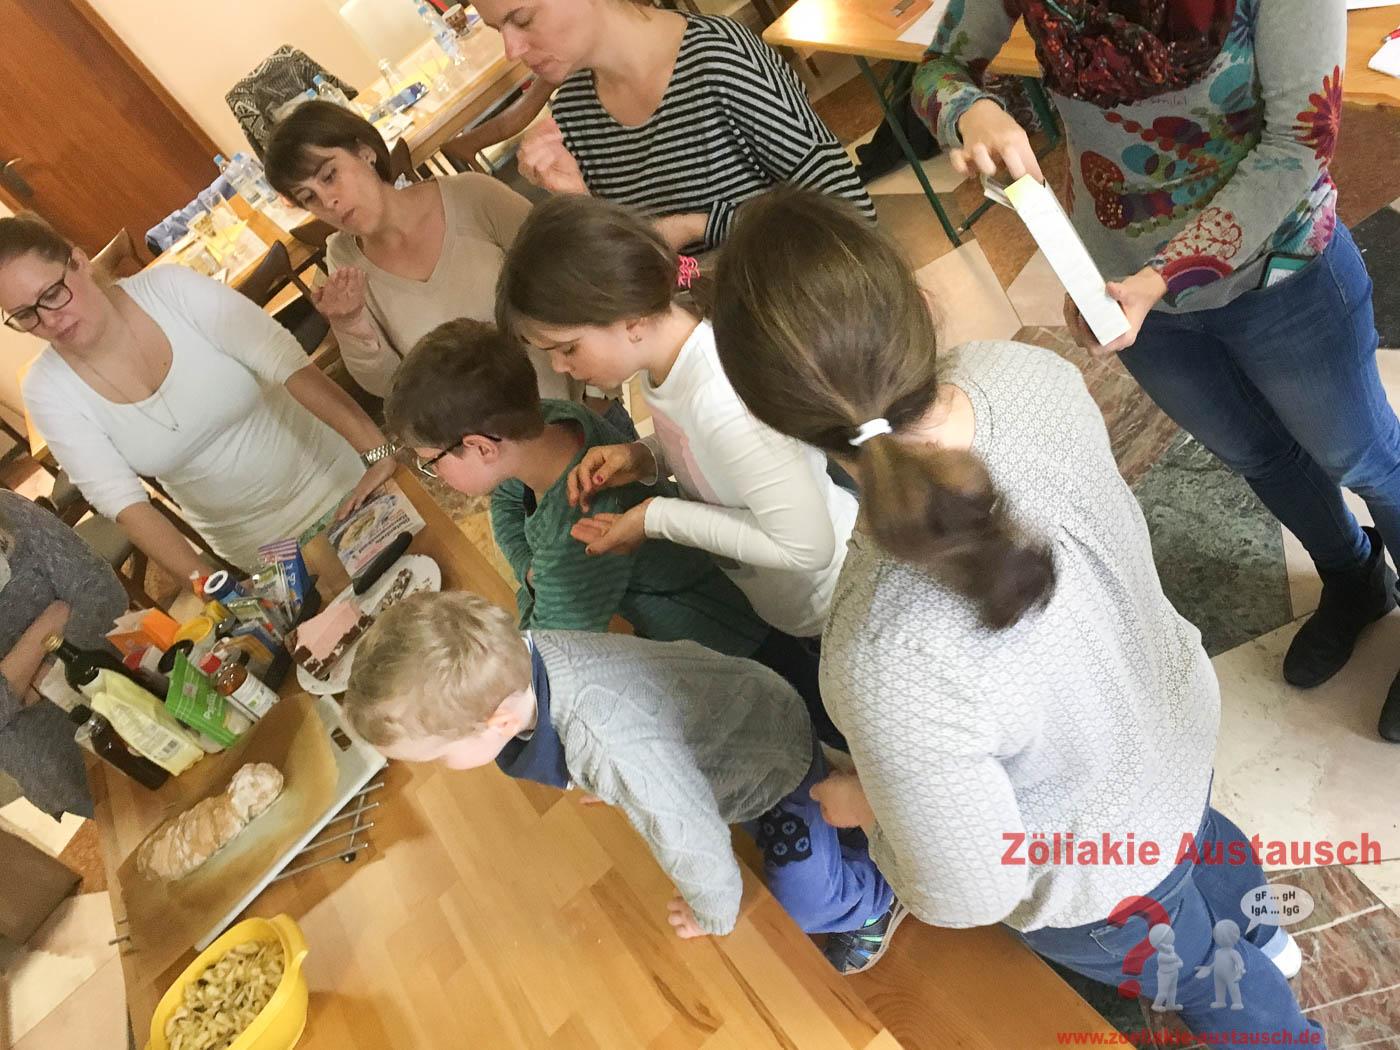 Zoeliakie_Austausch_Tanja_Gruber-Backkurs_2017-030